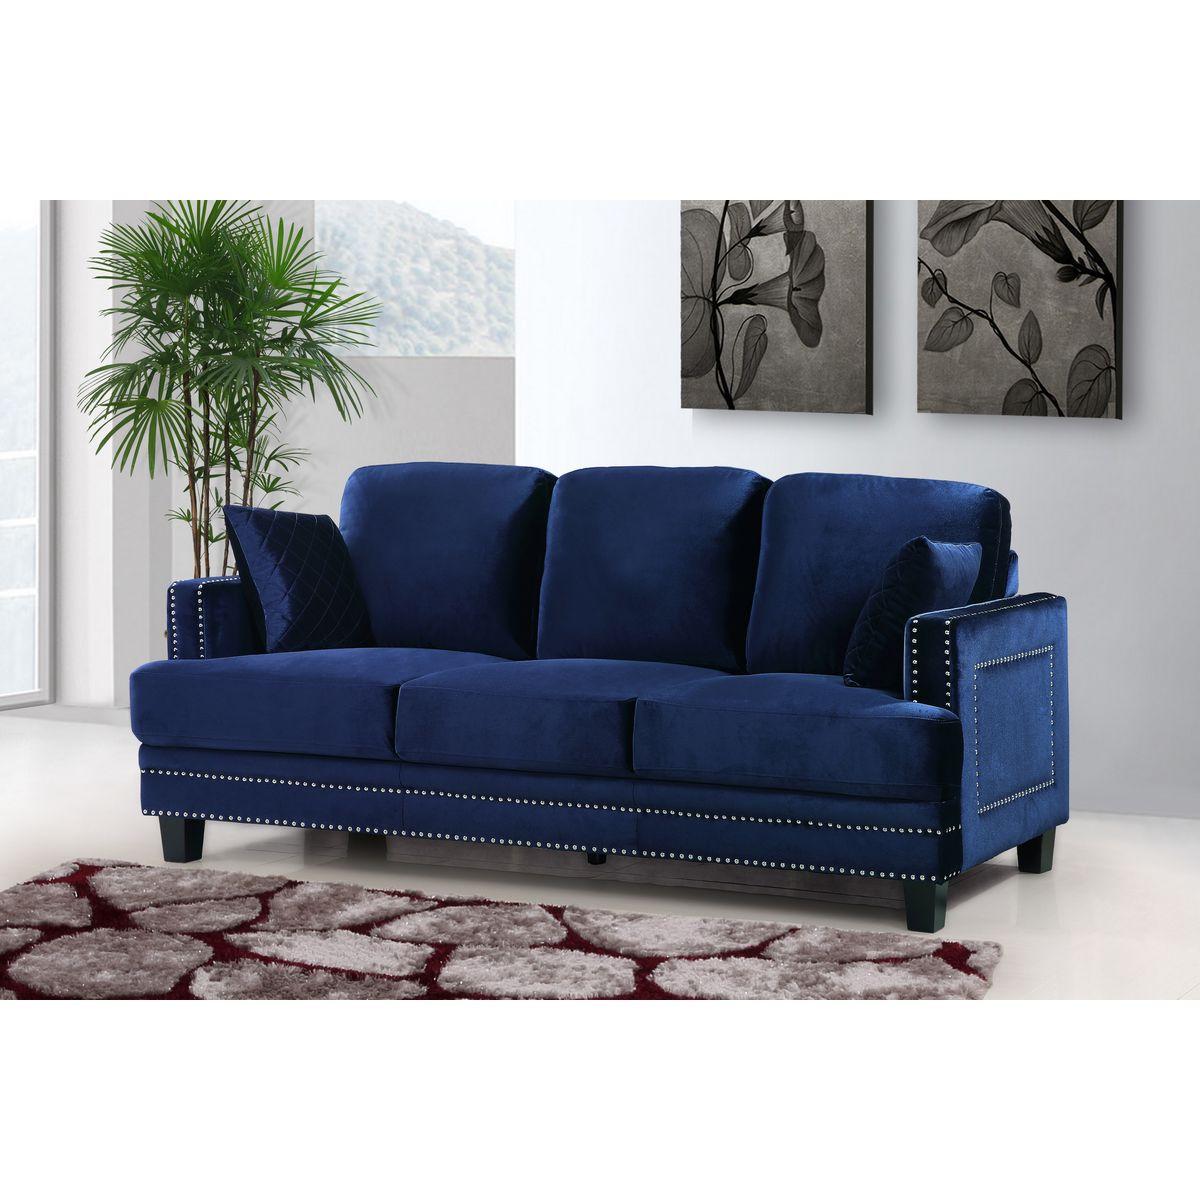 Navy Velvet Sofa w/ Silver Nailhead & Quilted Pillows #dynamichome #sofa #navy #velvet #fabric #transitional #modern #contemporary #nailhead #blue #livingroom #interiors #interiordesign #homedecor #color #greatroom #familyroom